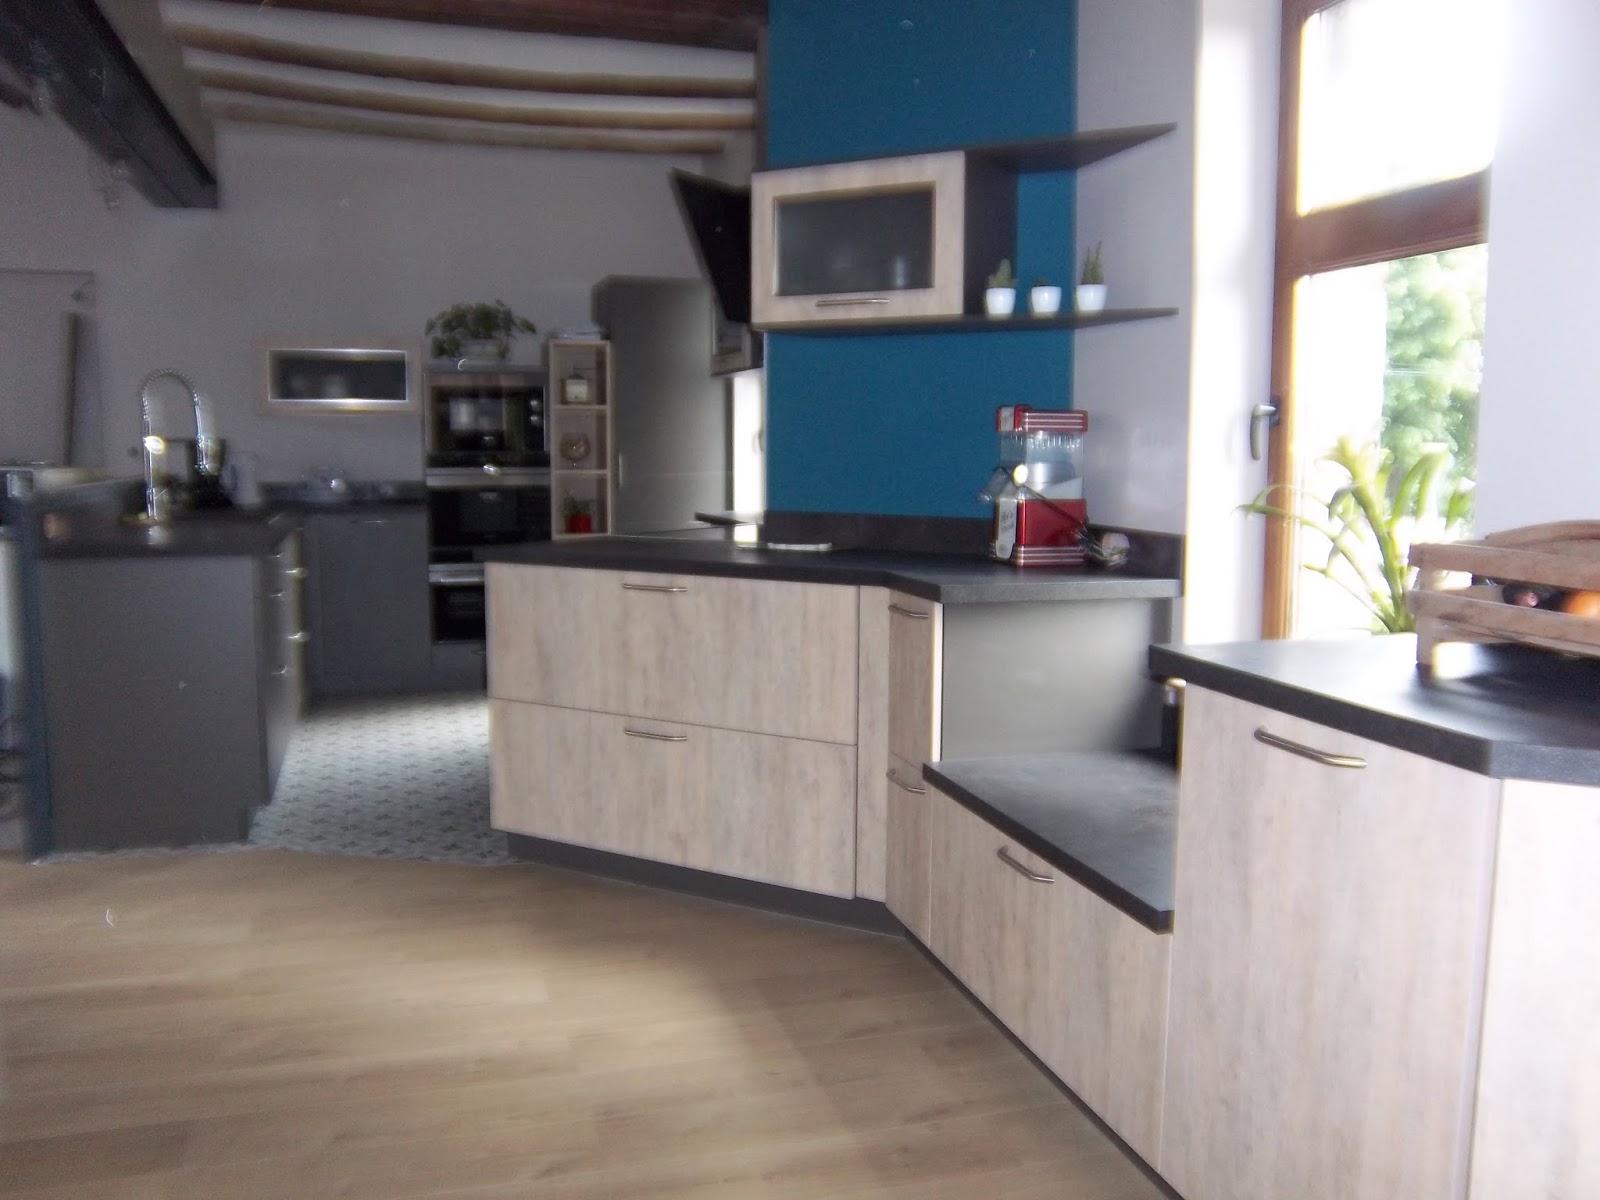 cuisine esprit loft industriel. Black Bedroom Furniture Sets. Home Design Ideas